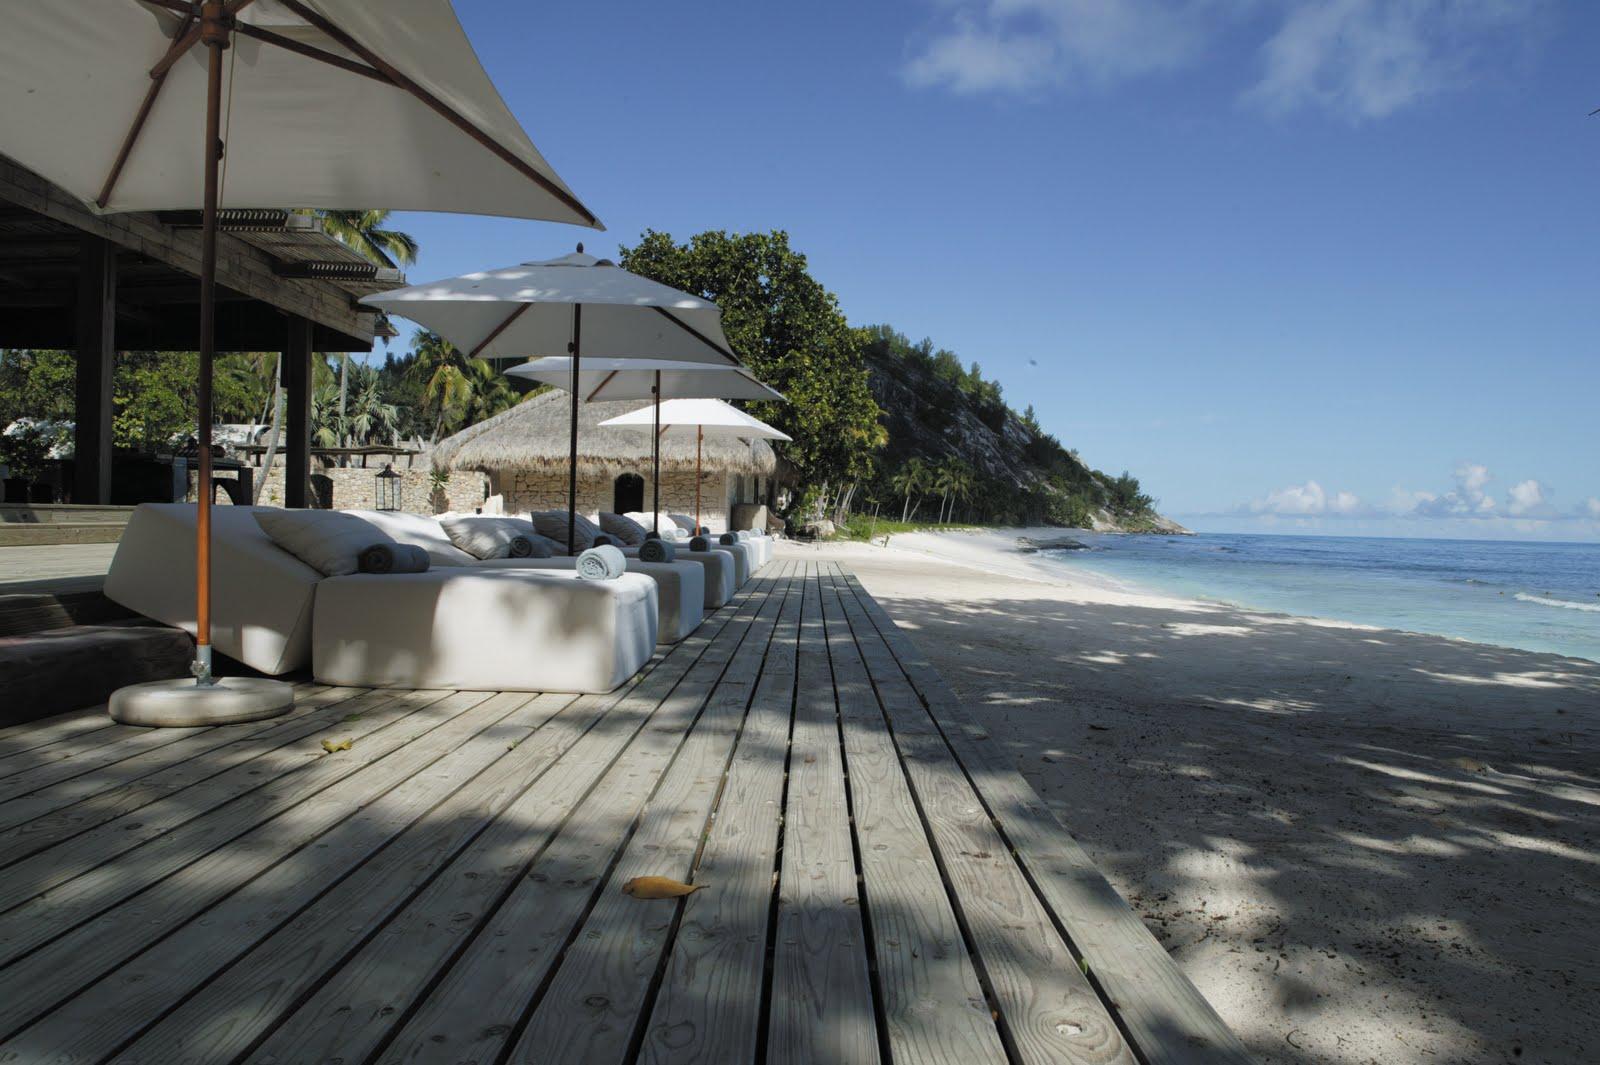 north island seychelles cool hotels. Black Bedroom Furniture Sets. Home Design Ideas